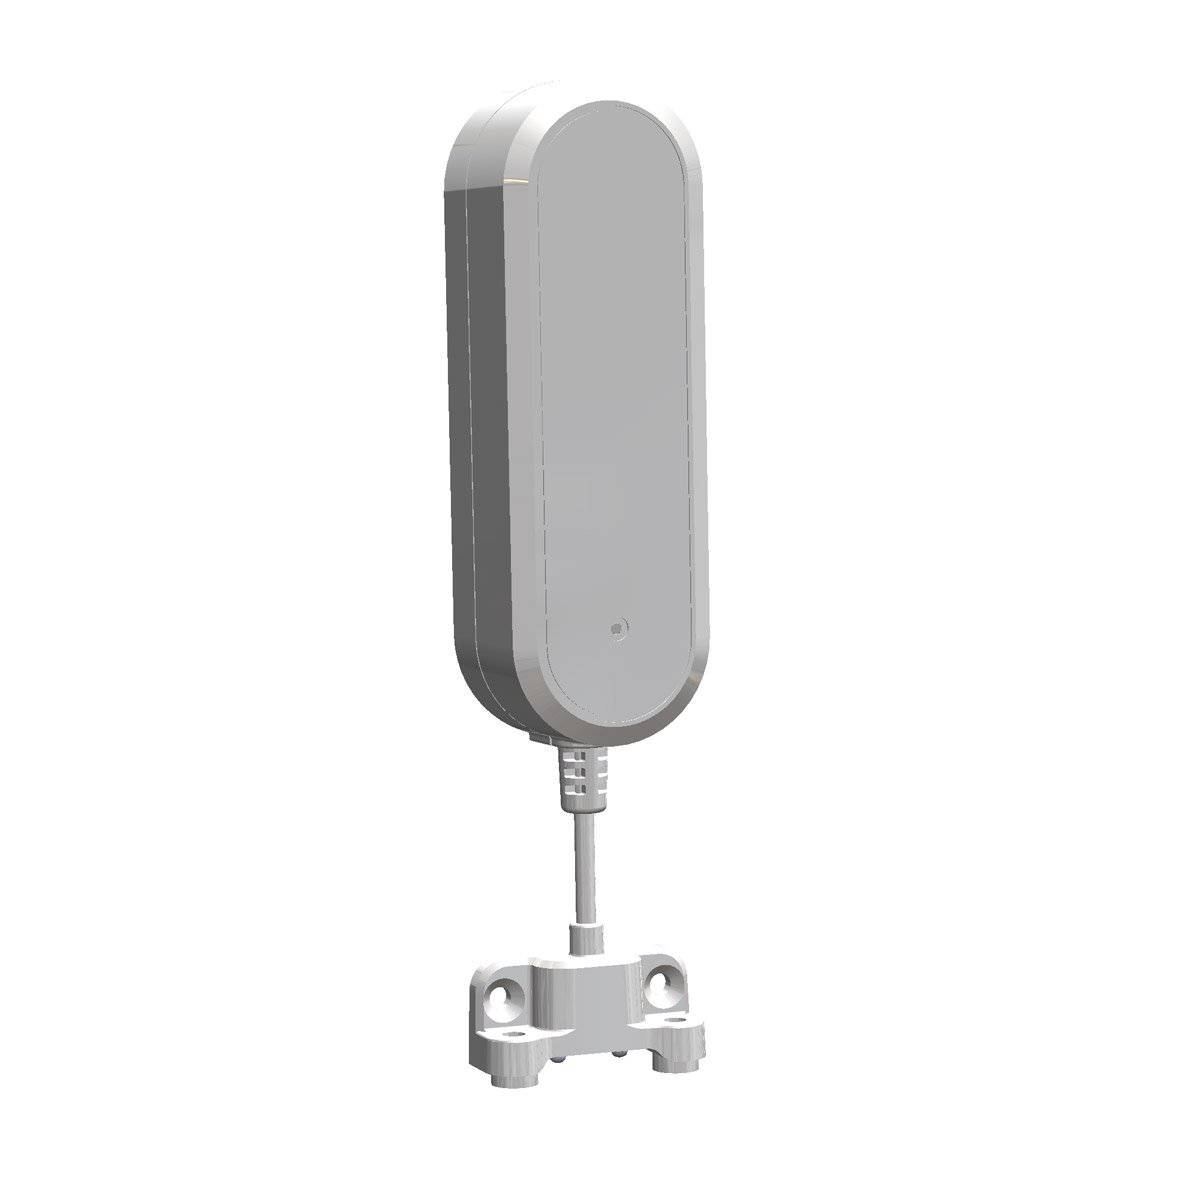 Square Case Triple NWL-DETFLD-6-01 NWL Water Flood Detector Triple